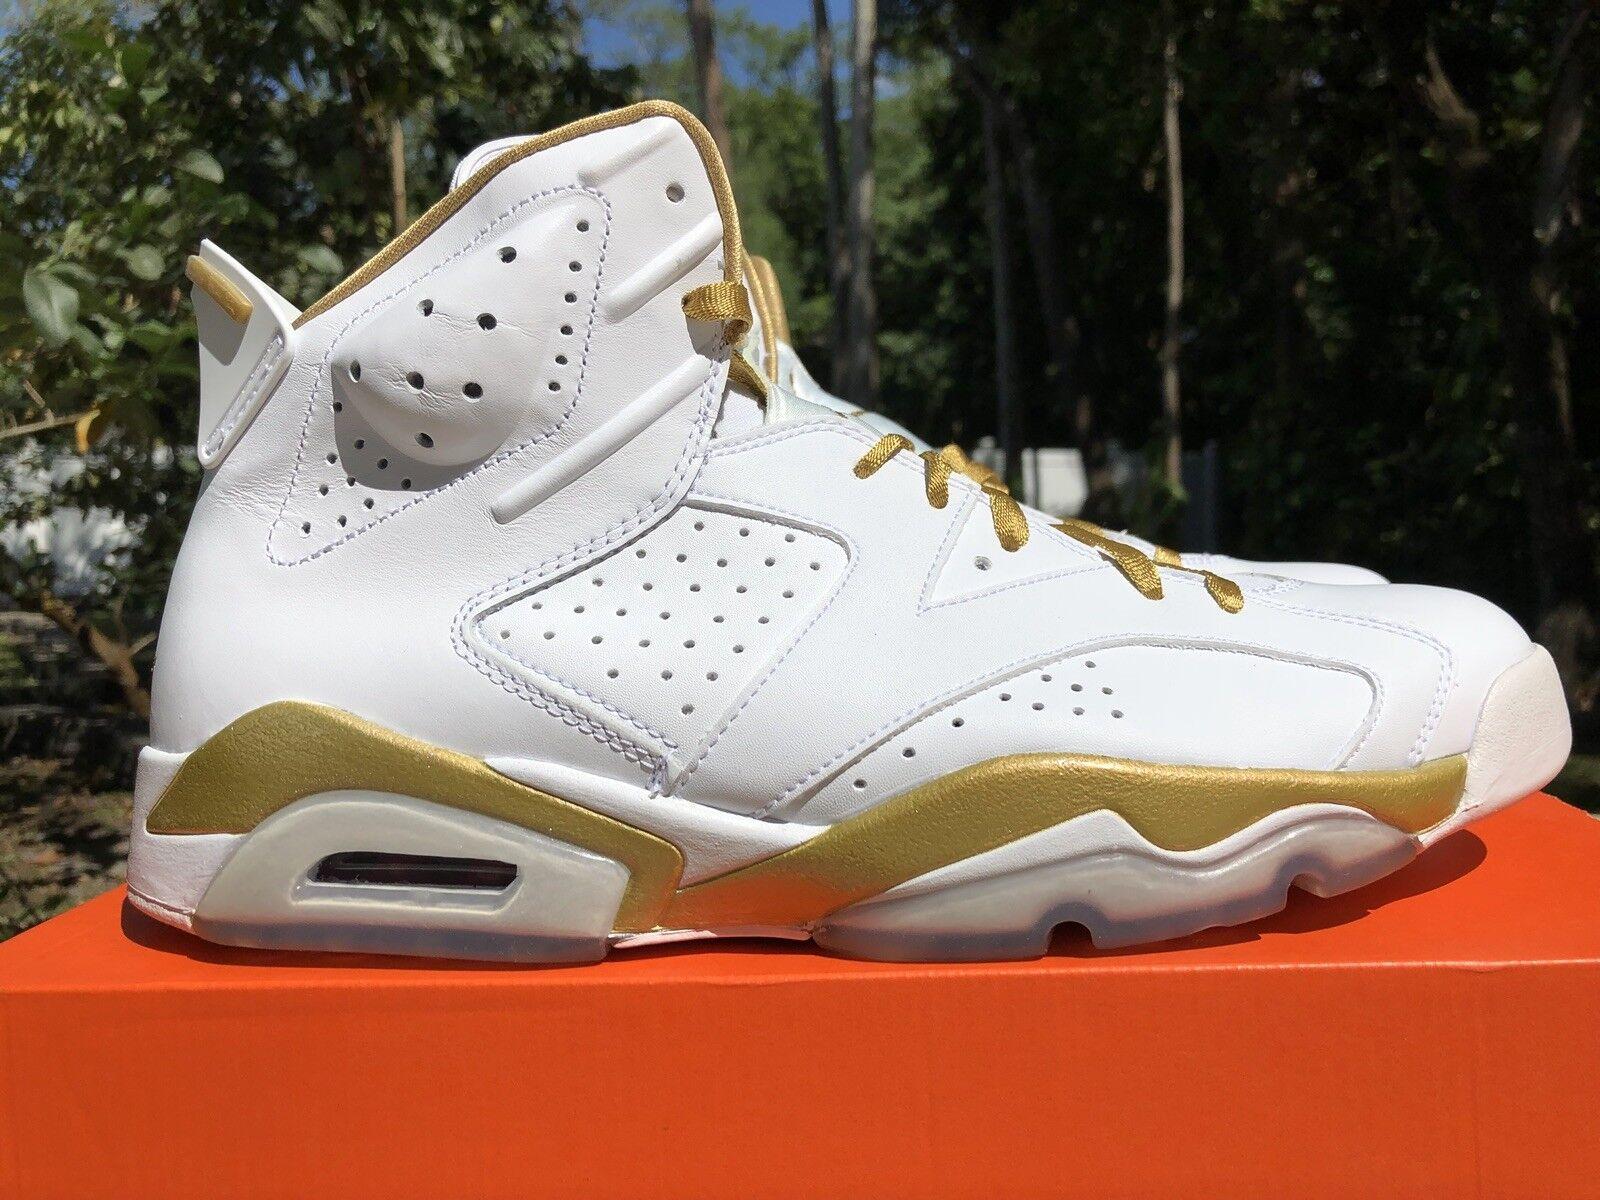 Nike Air Jordan 6 VI Retro Black gold GMP golden Moments Size 12. 535357-935